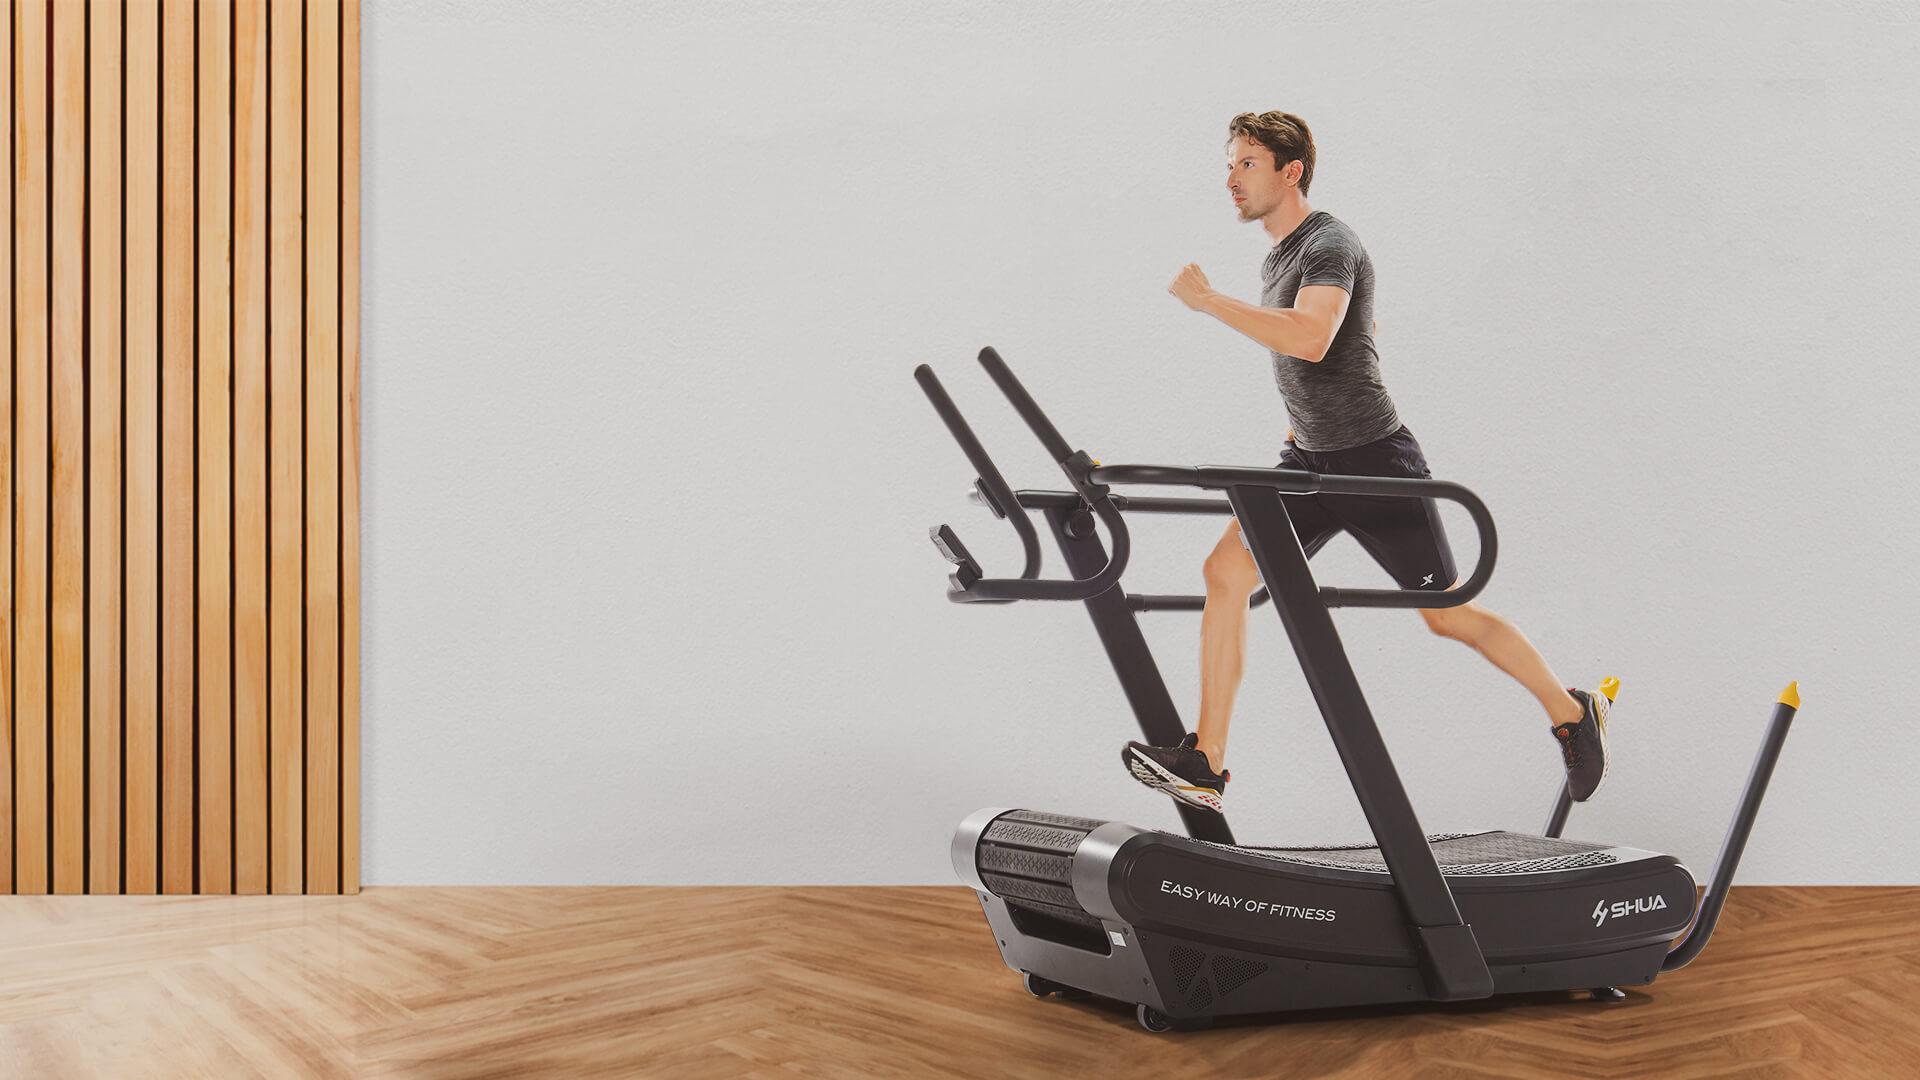 SHUA Curved Treadmill